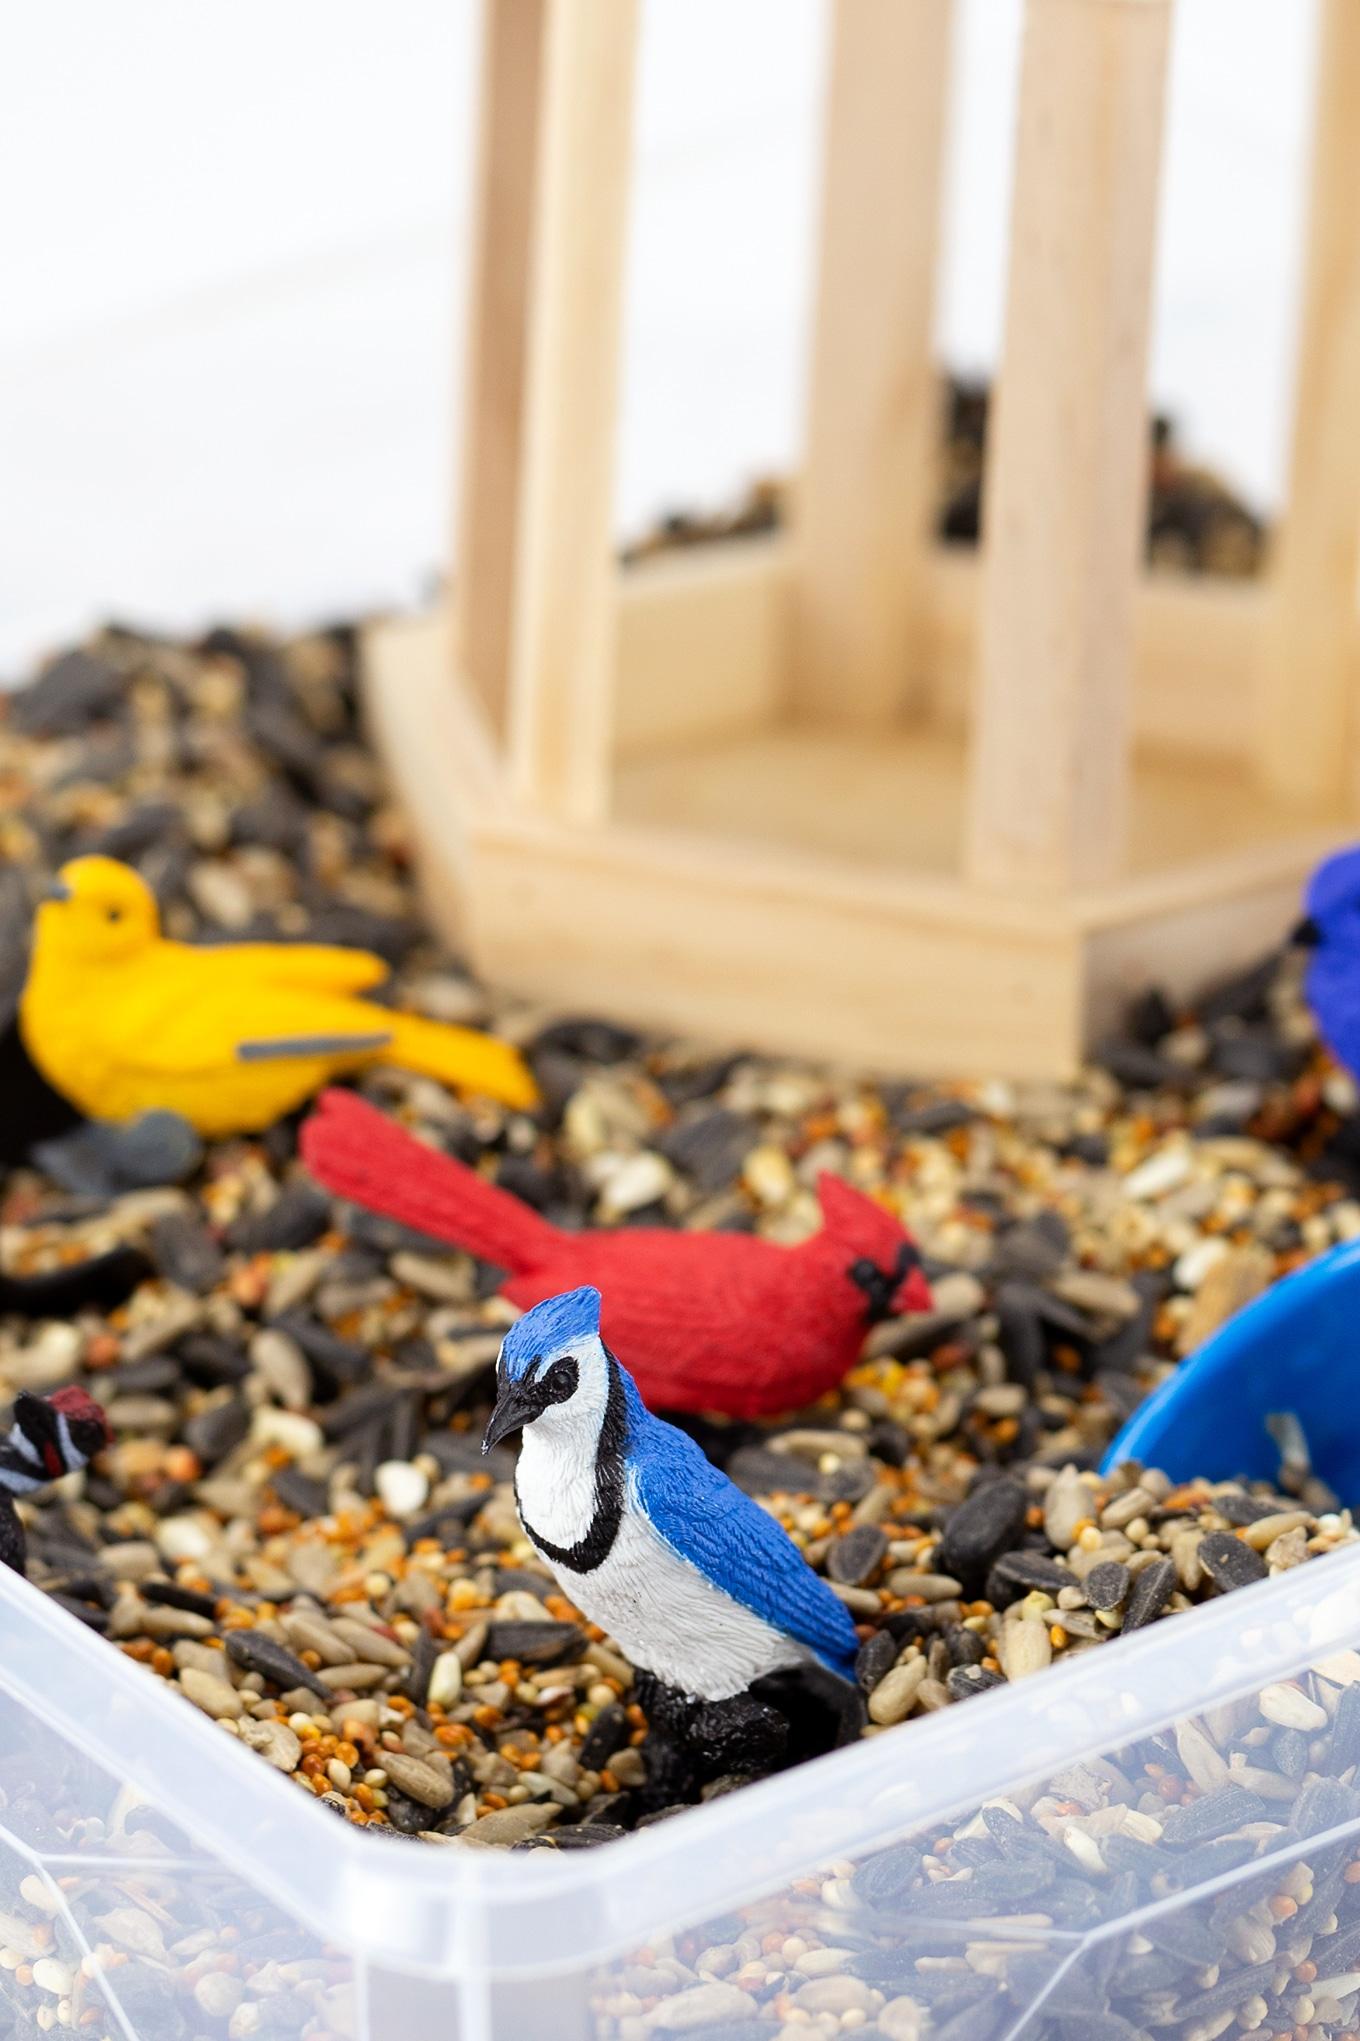 Bird Sensory Bin for Kids